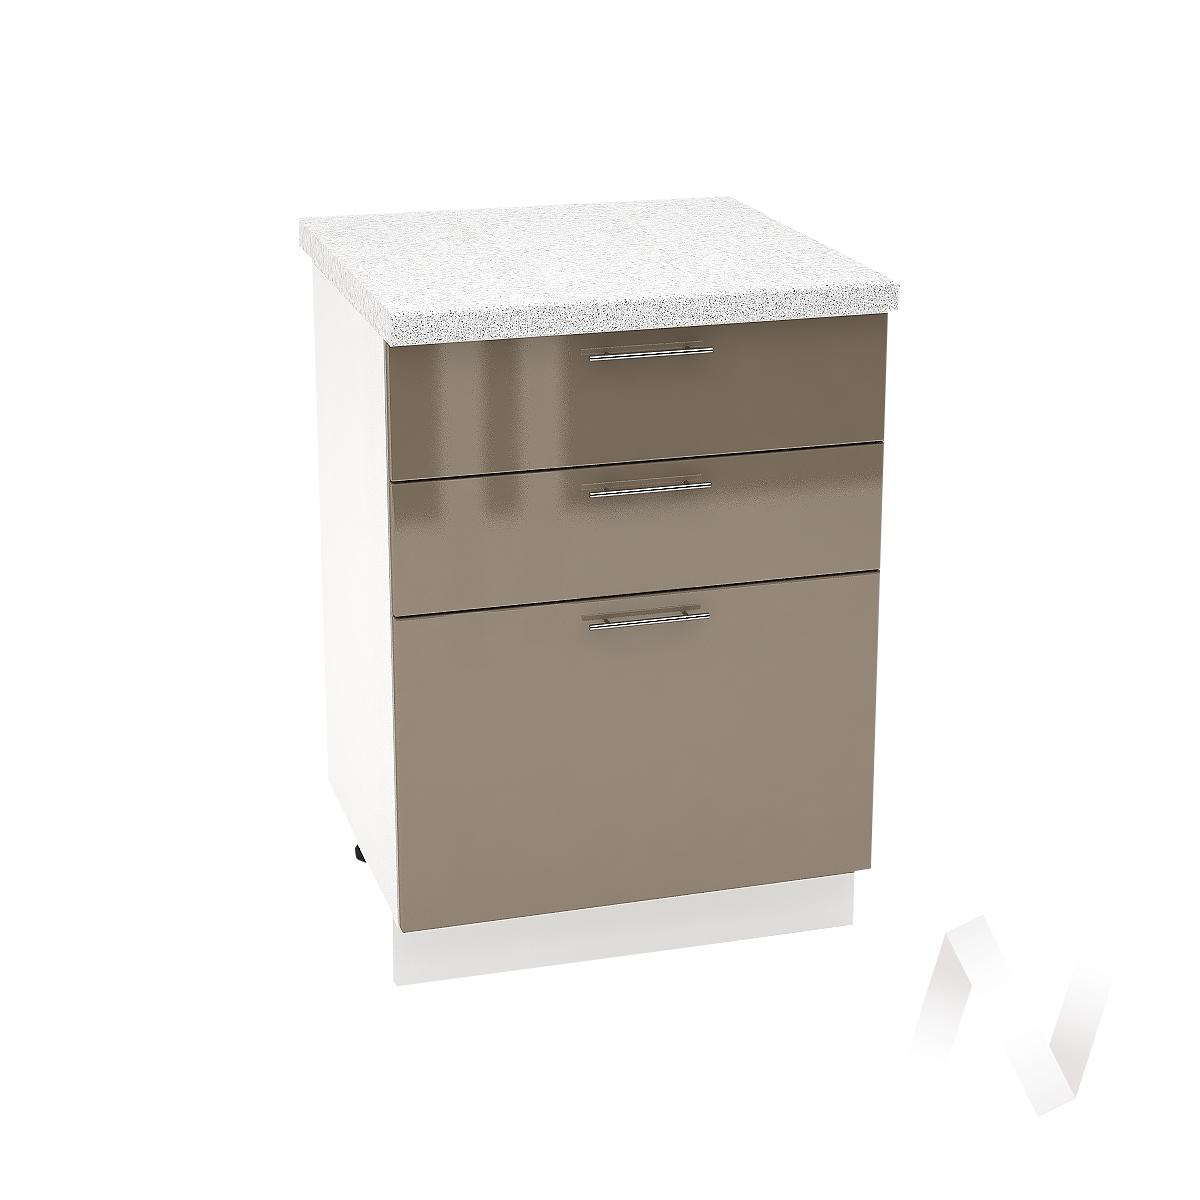 "Кухня ""Валерия-М"": Шкаф нижний с 3-мя ящиками 600, ШН3Я 600 (Капучино глянец/корпус белый)"